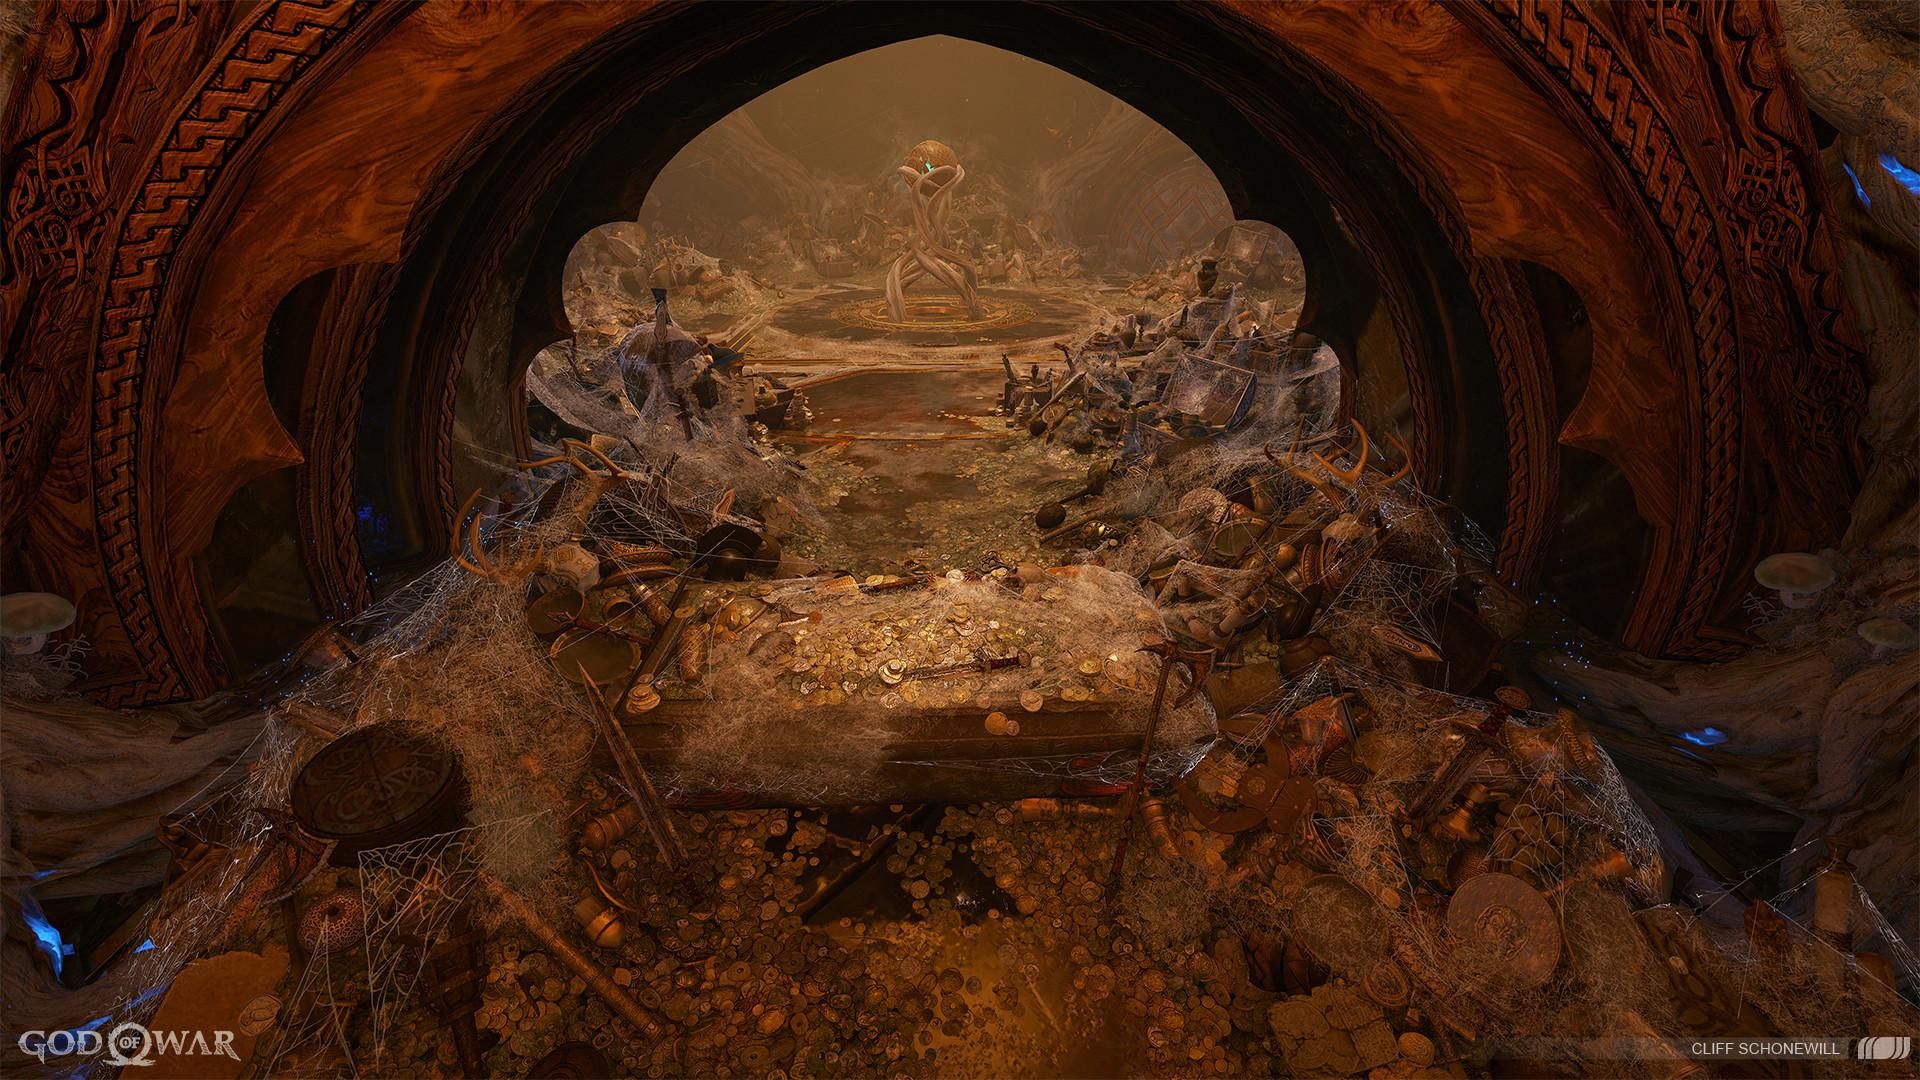 Cliff schonewill tyrsvault vaultrooms 10